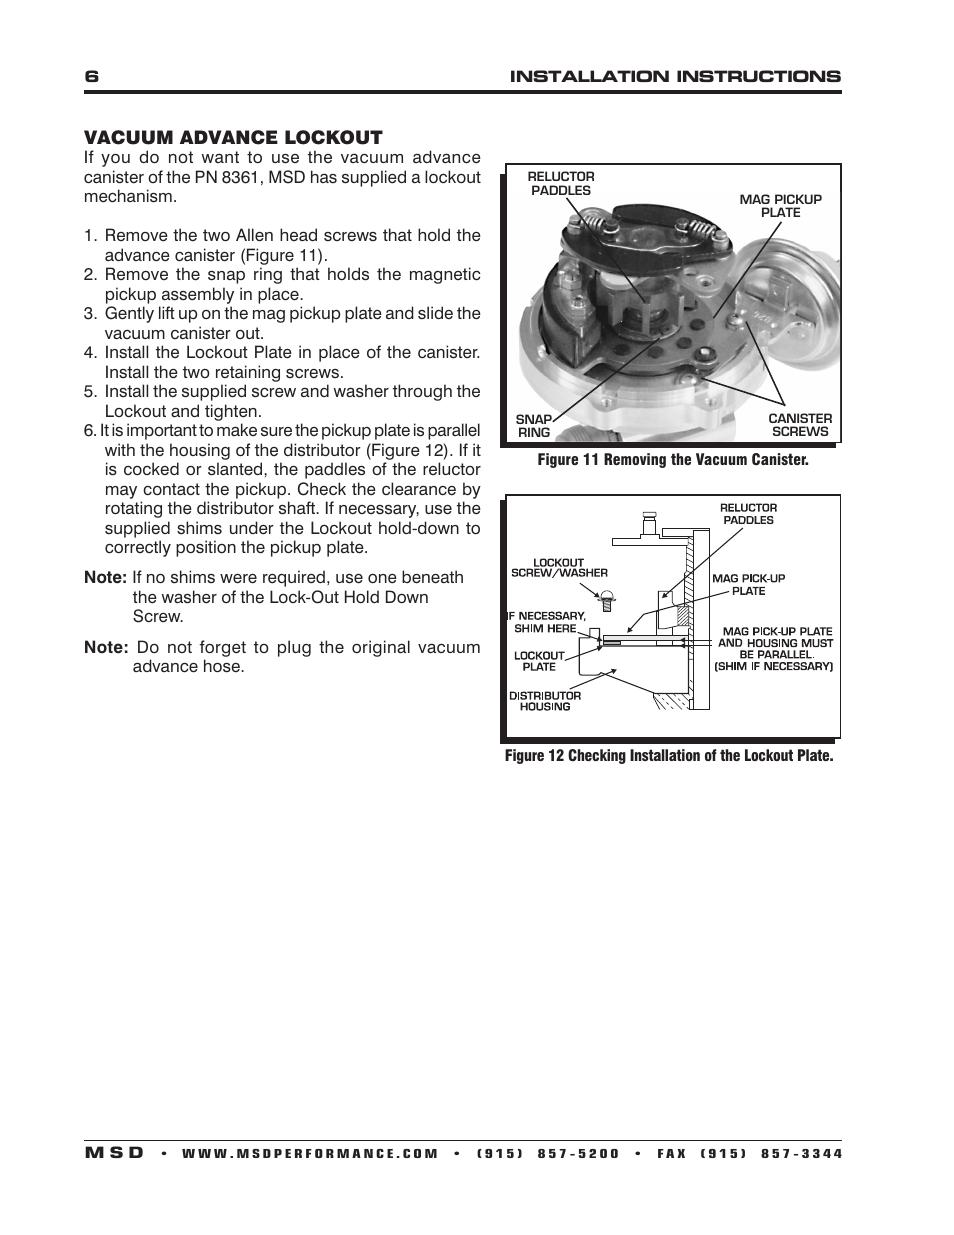 MSD 85551 Chevy V8 Pro-Billet Distributor Installation